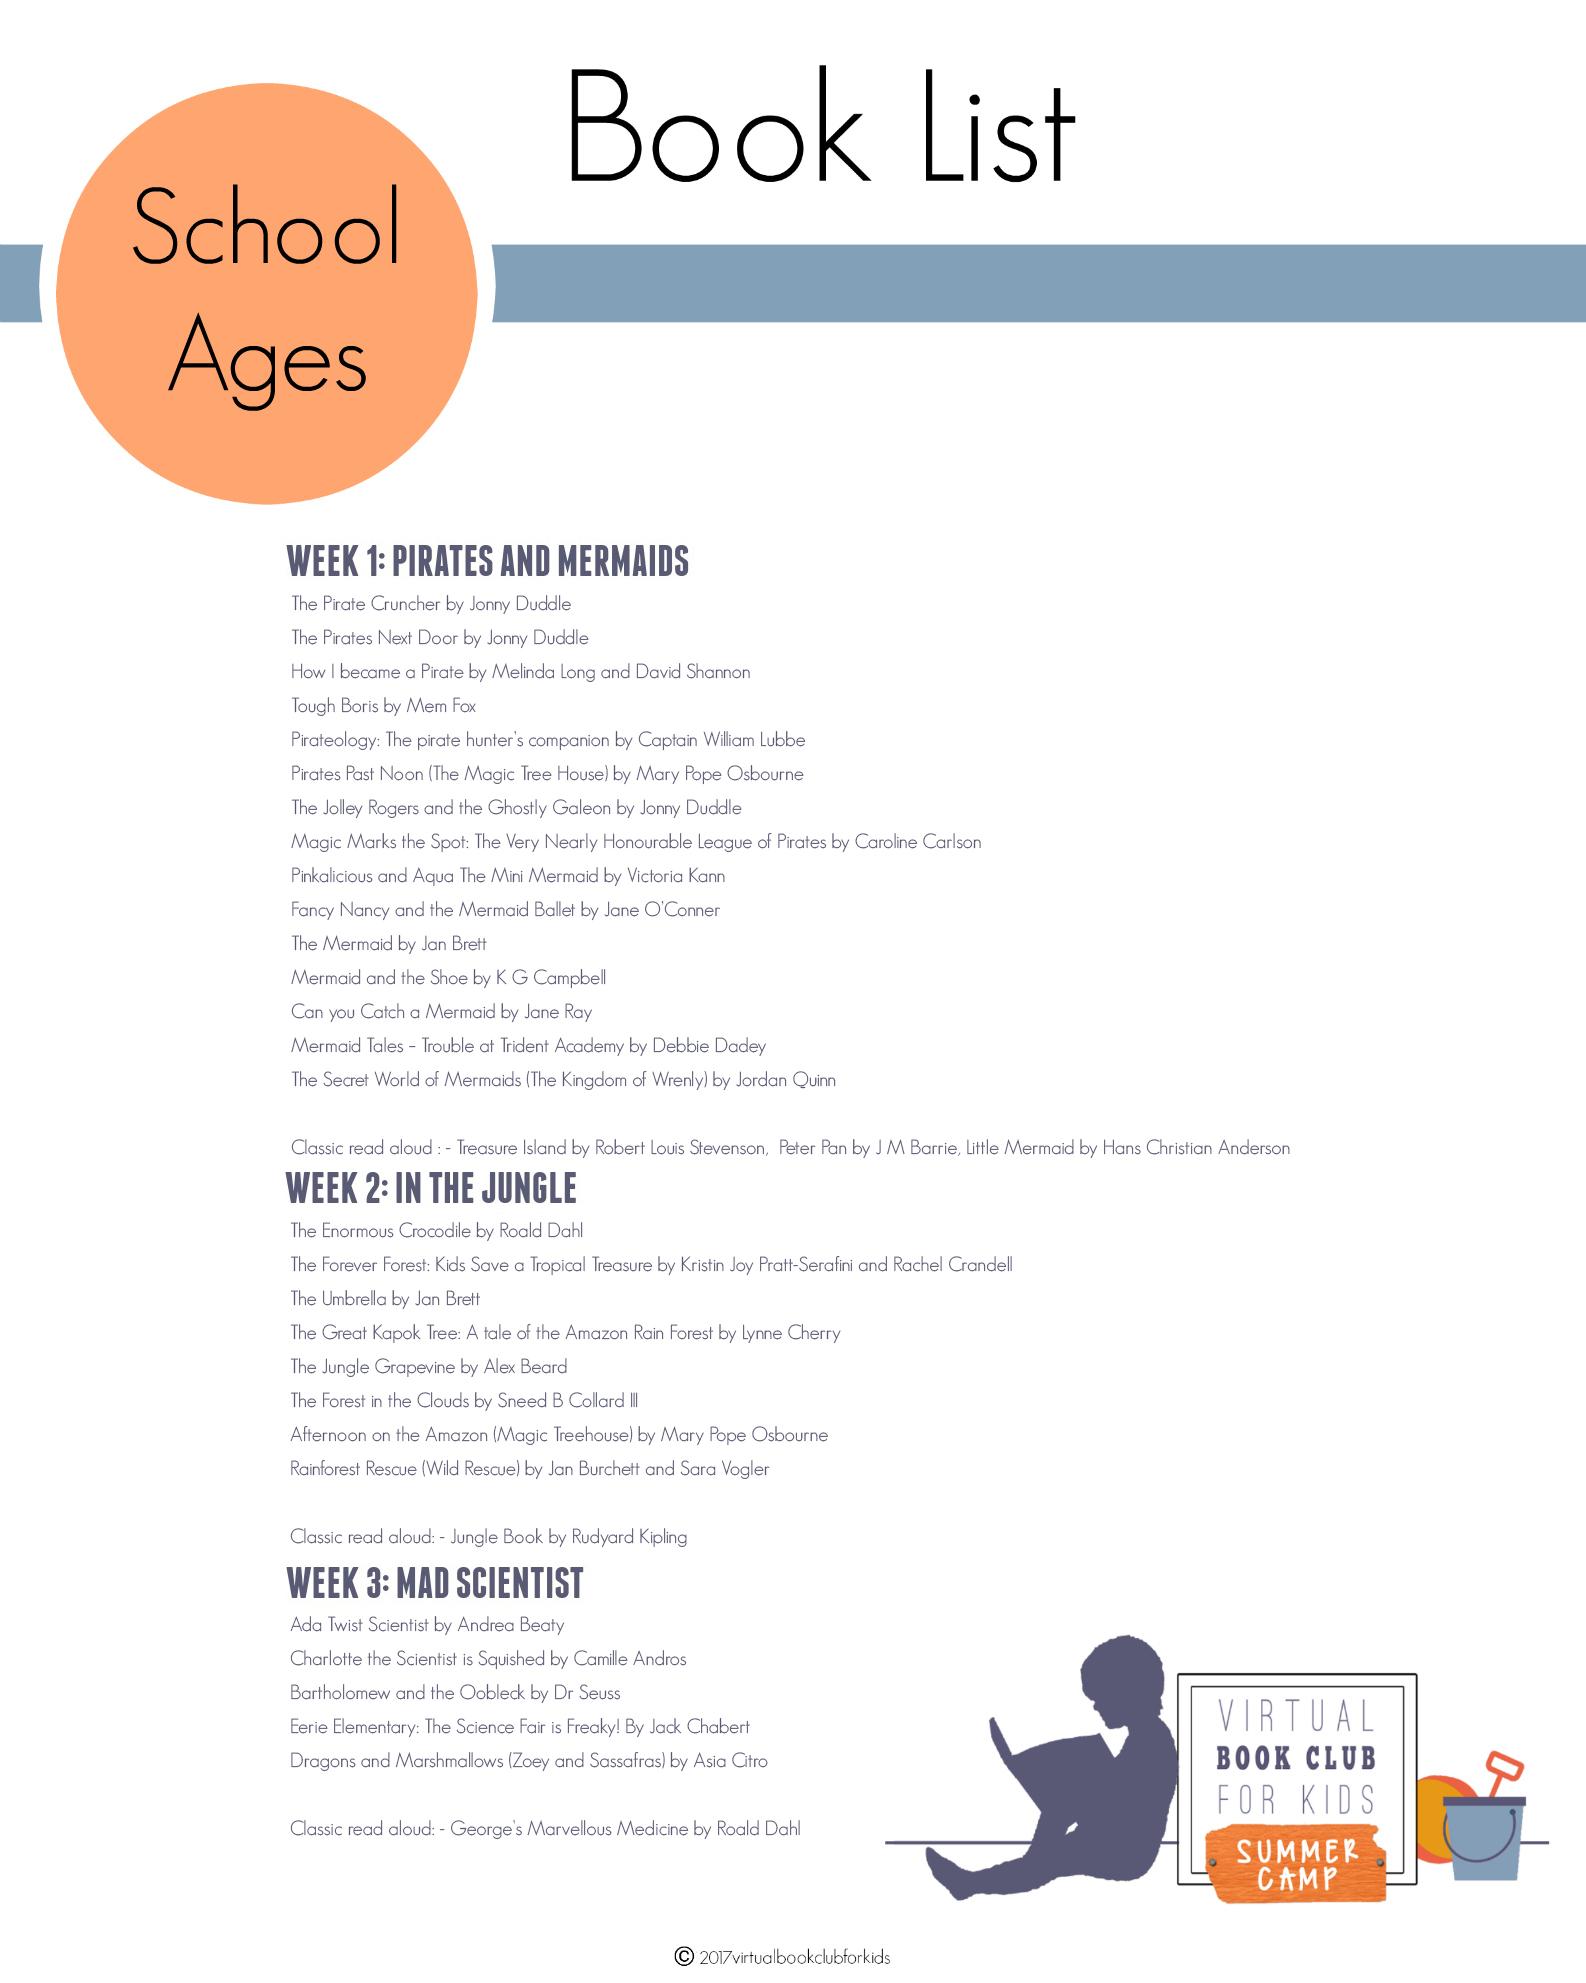 School Kids Book List for Virtual Book Club Summer Camp